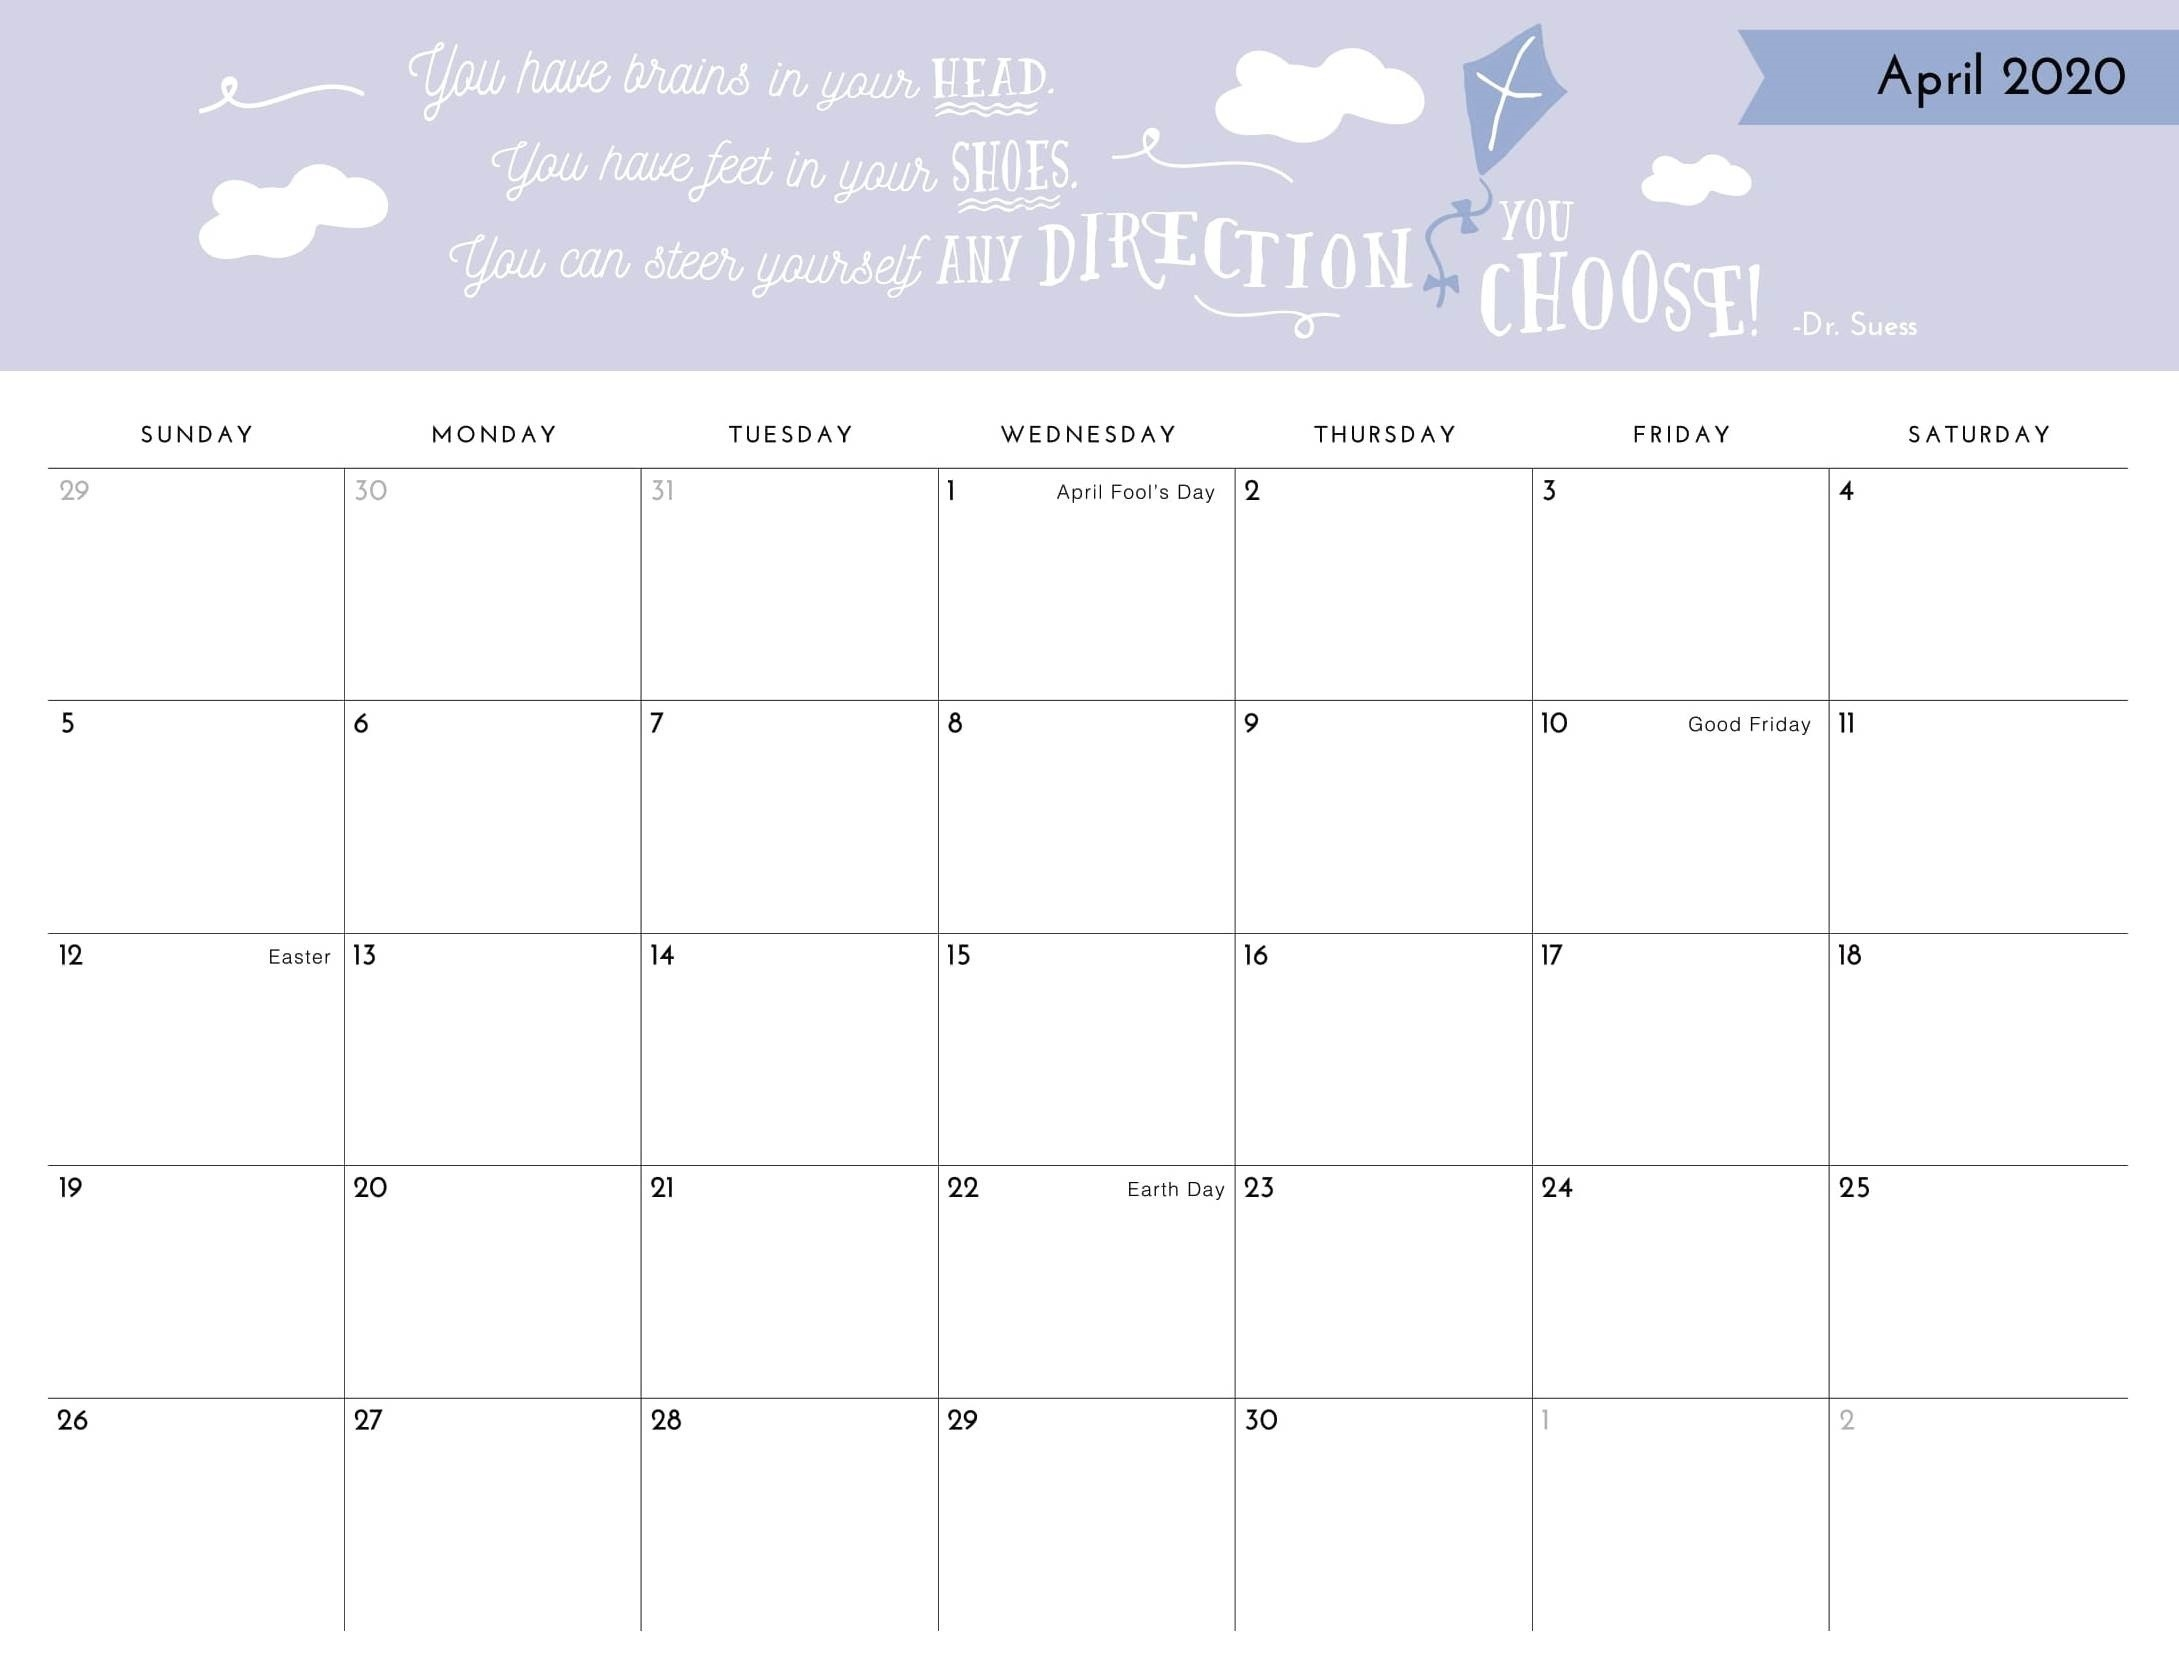 April 2020 Printable Calendar Template With Holidays - Web  Calendar Templates For Churches